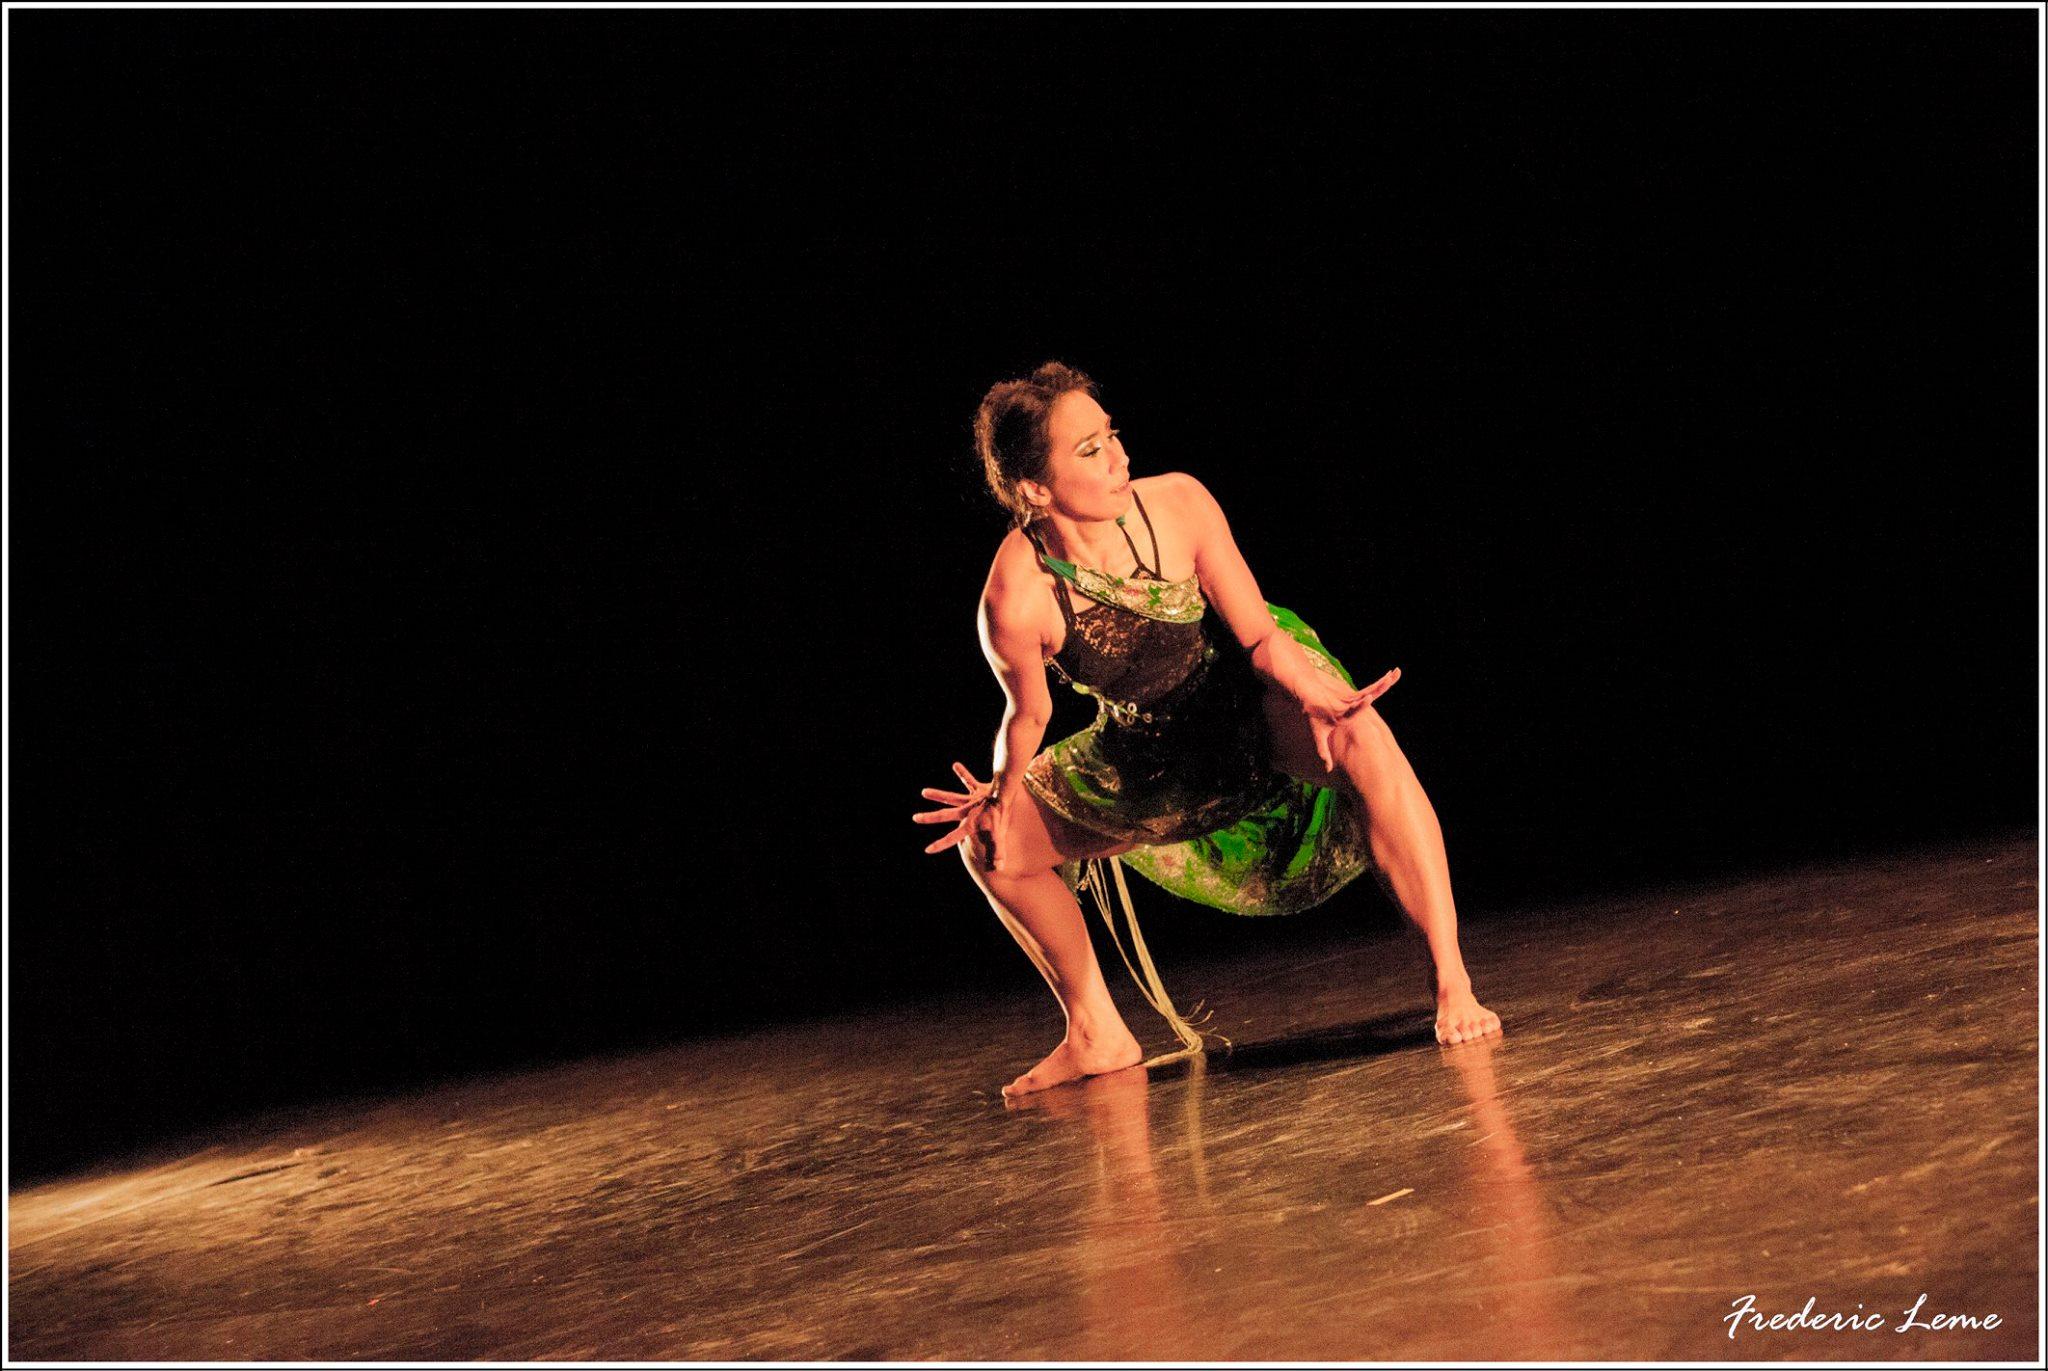 Anasma Vuong